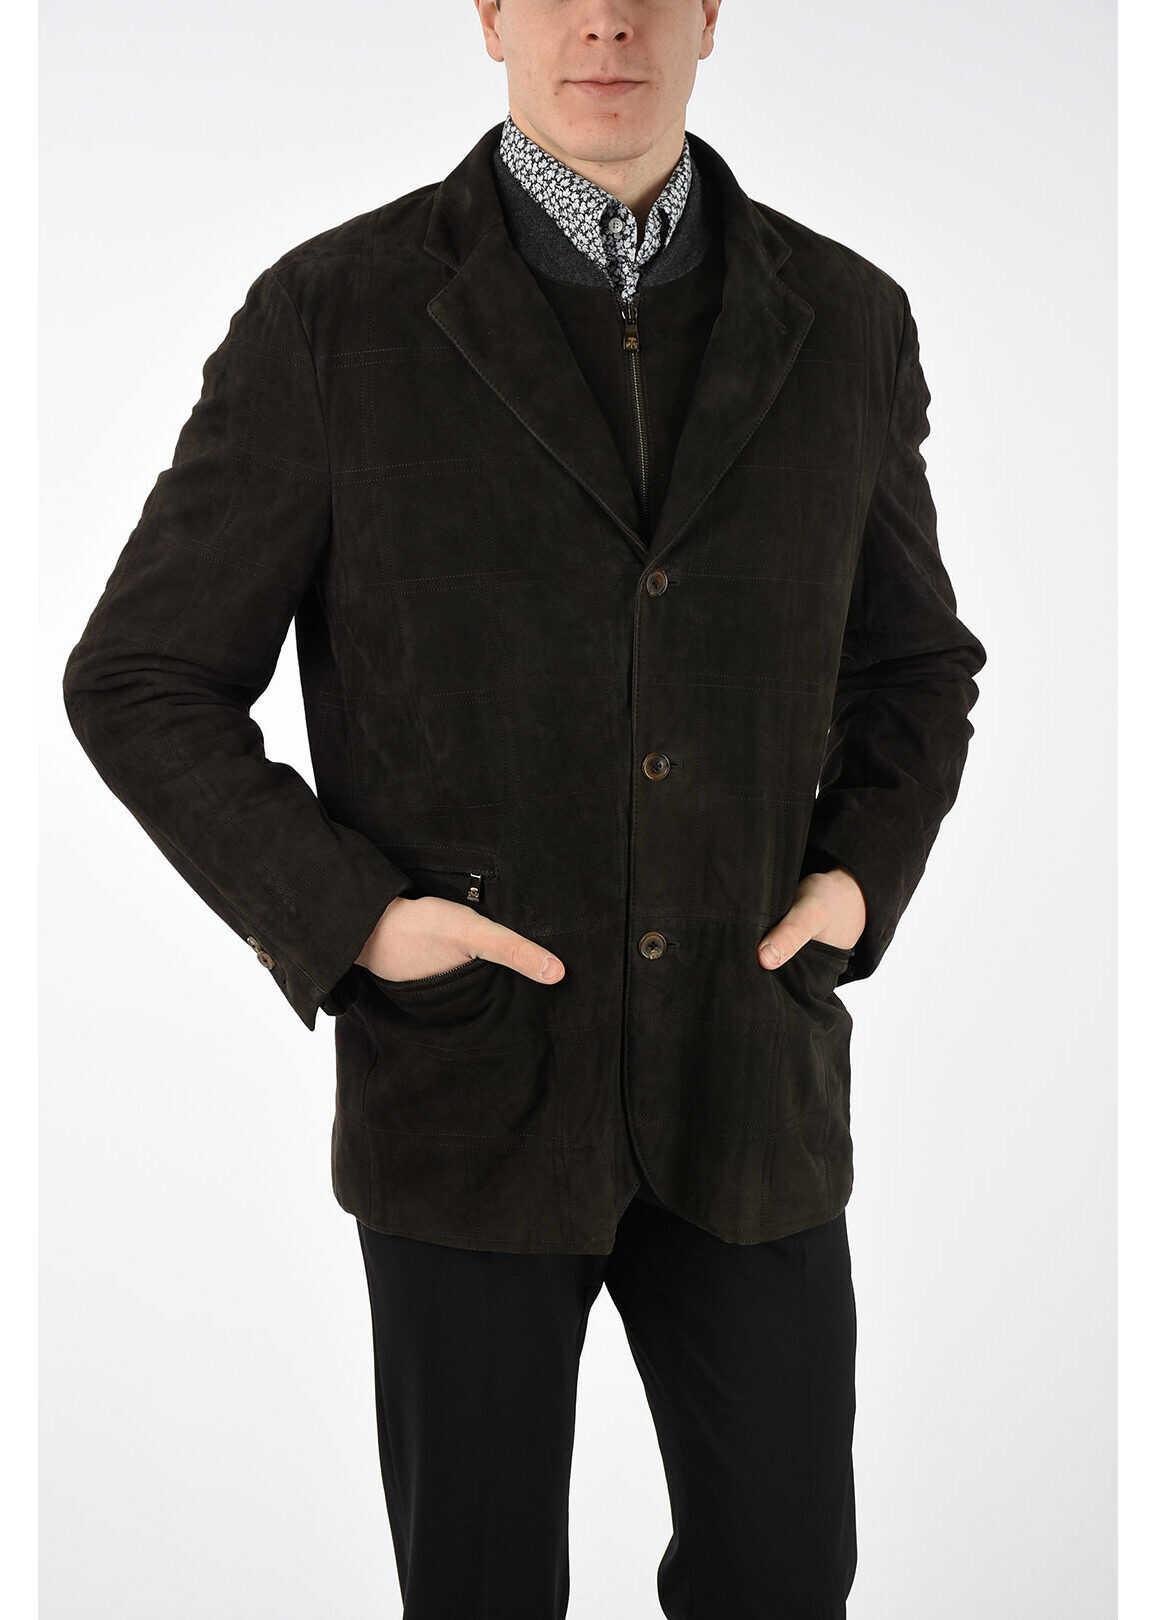 CORNELIANI ID Leather Coat BROWN